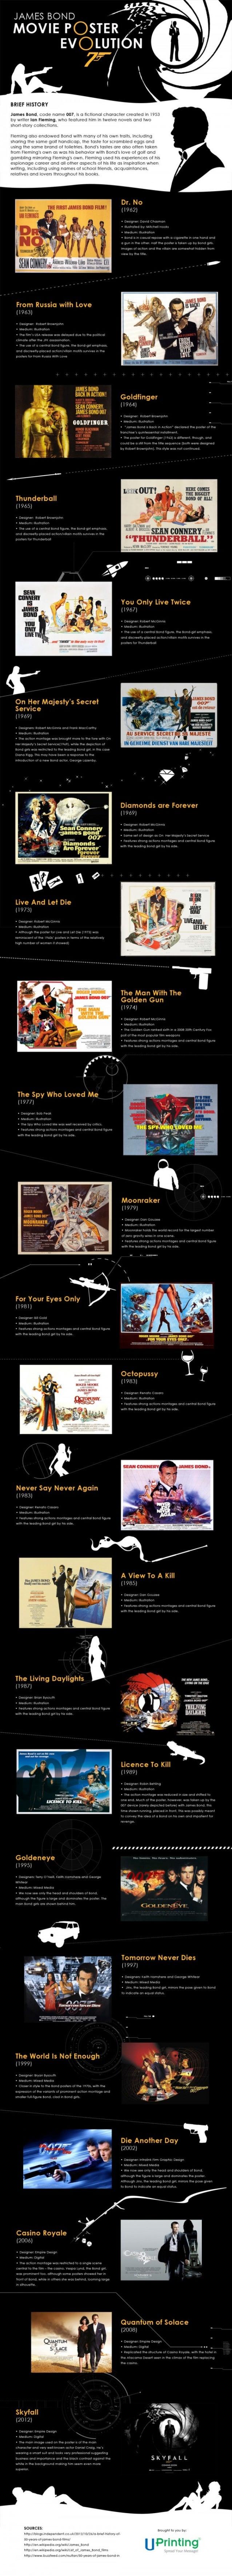 James bond-movie-poster-evolution-infographic